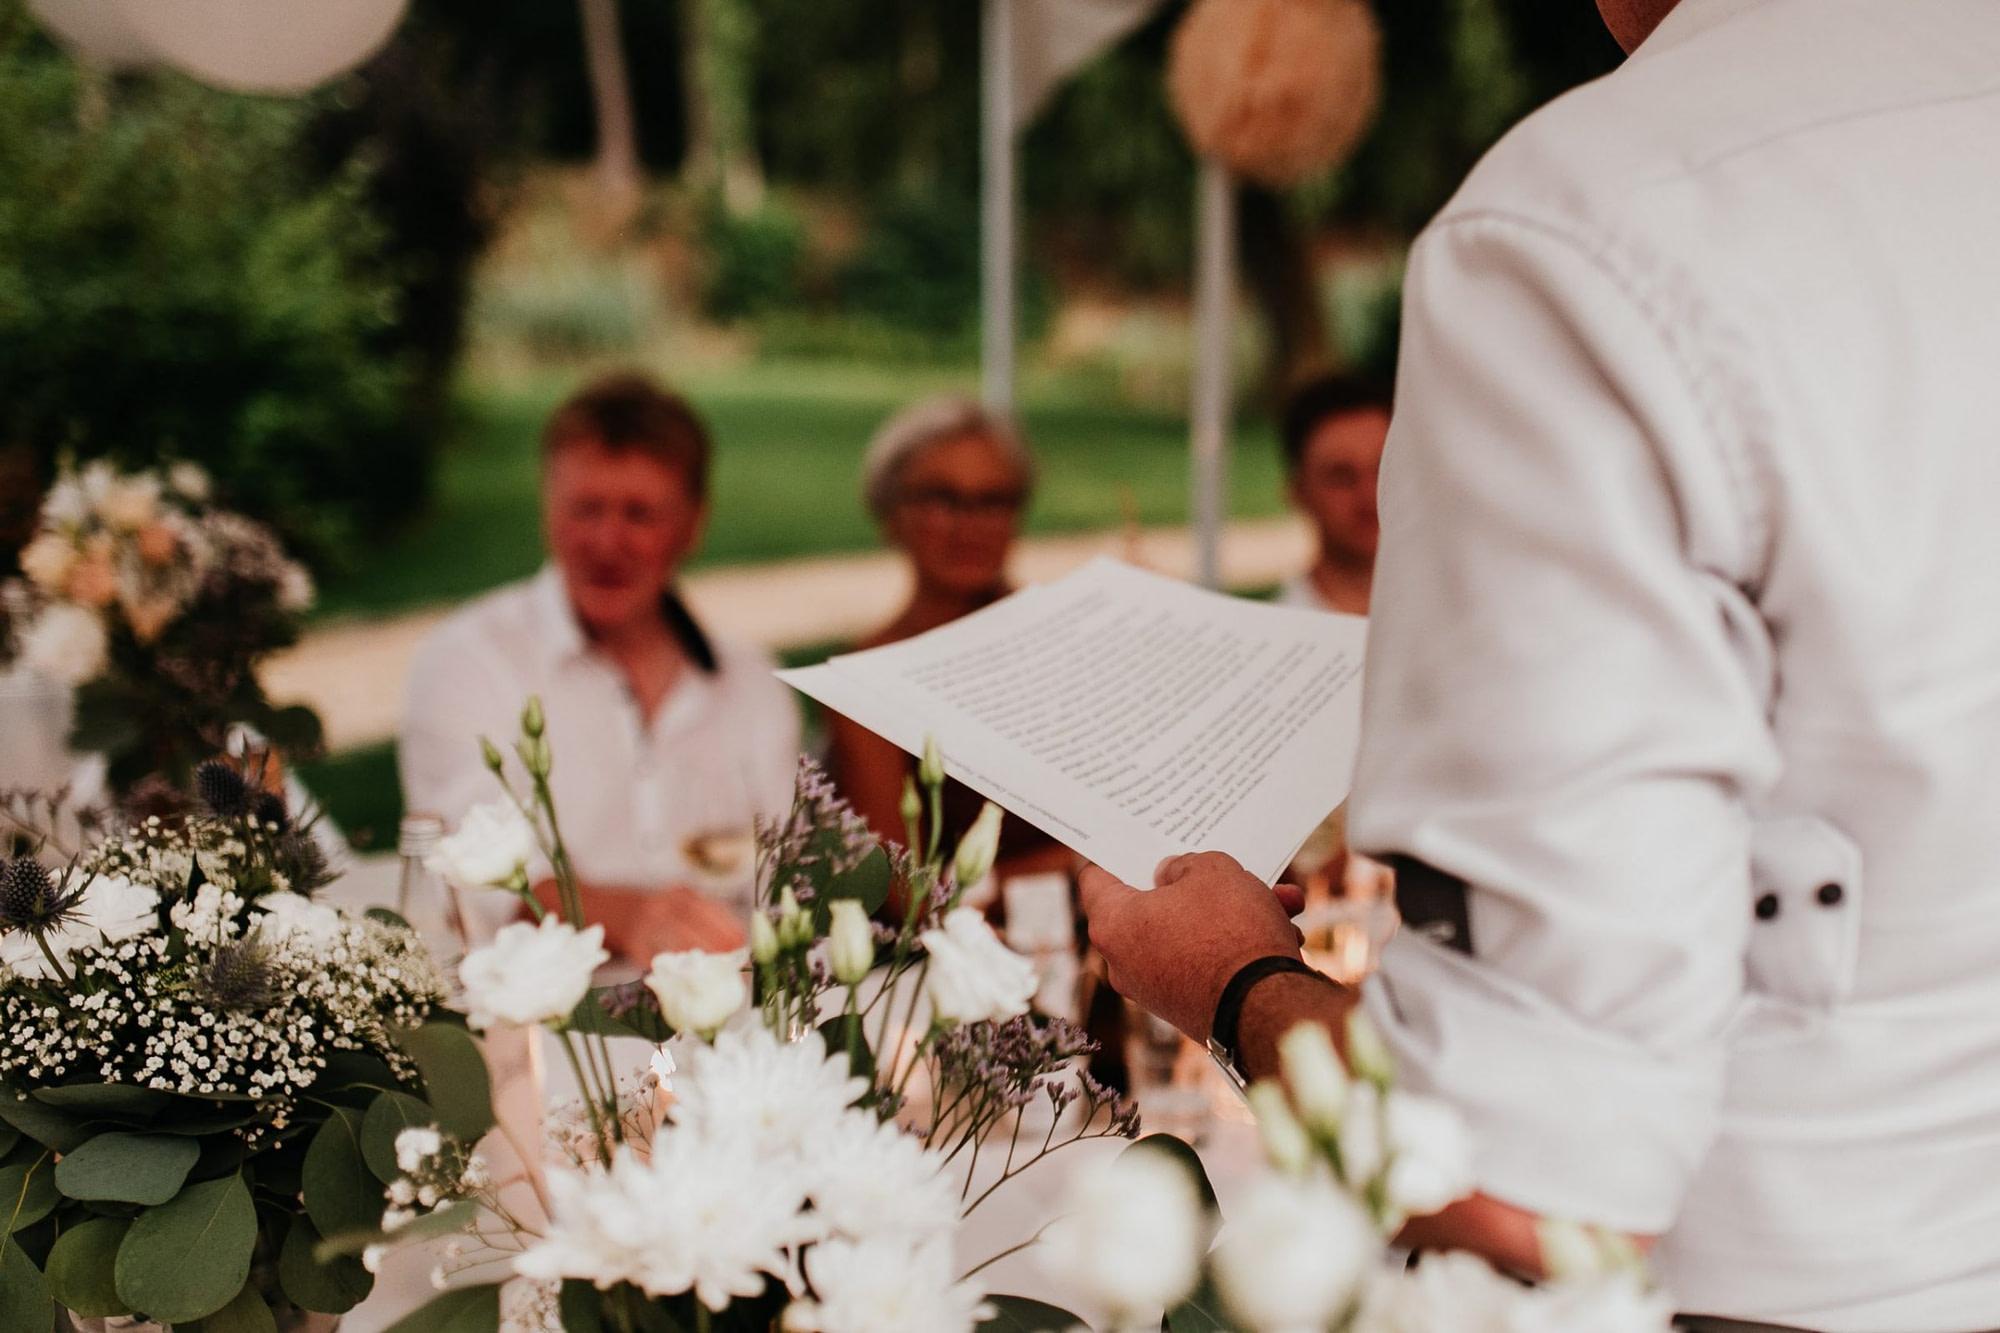 wedding guests, laughter, laughing, table decor, garden wedding, garden tent, hochzeitsgäste, zelt, letter, rede, brautvater